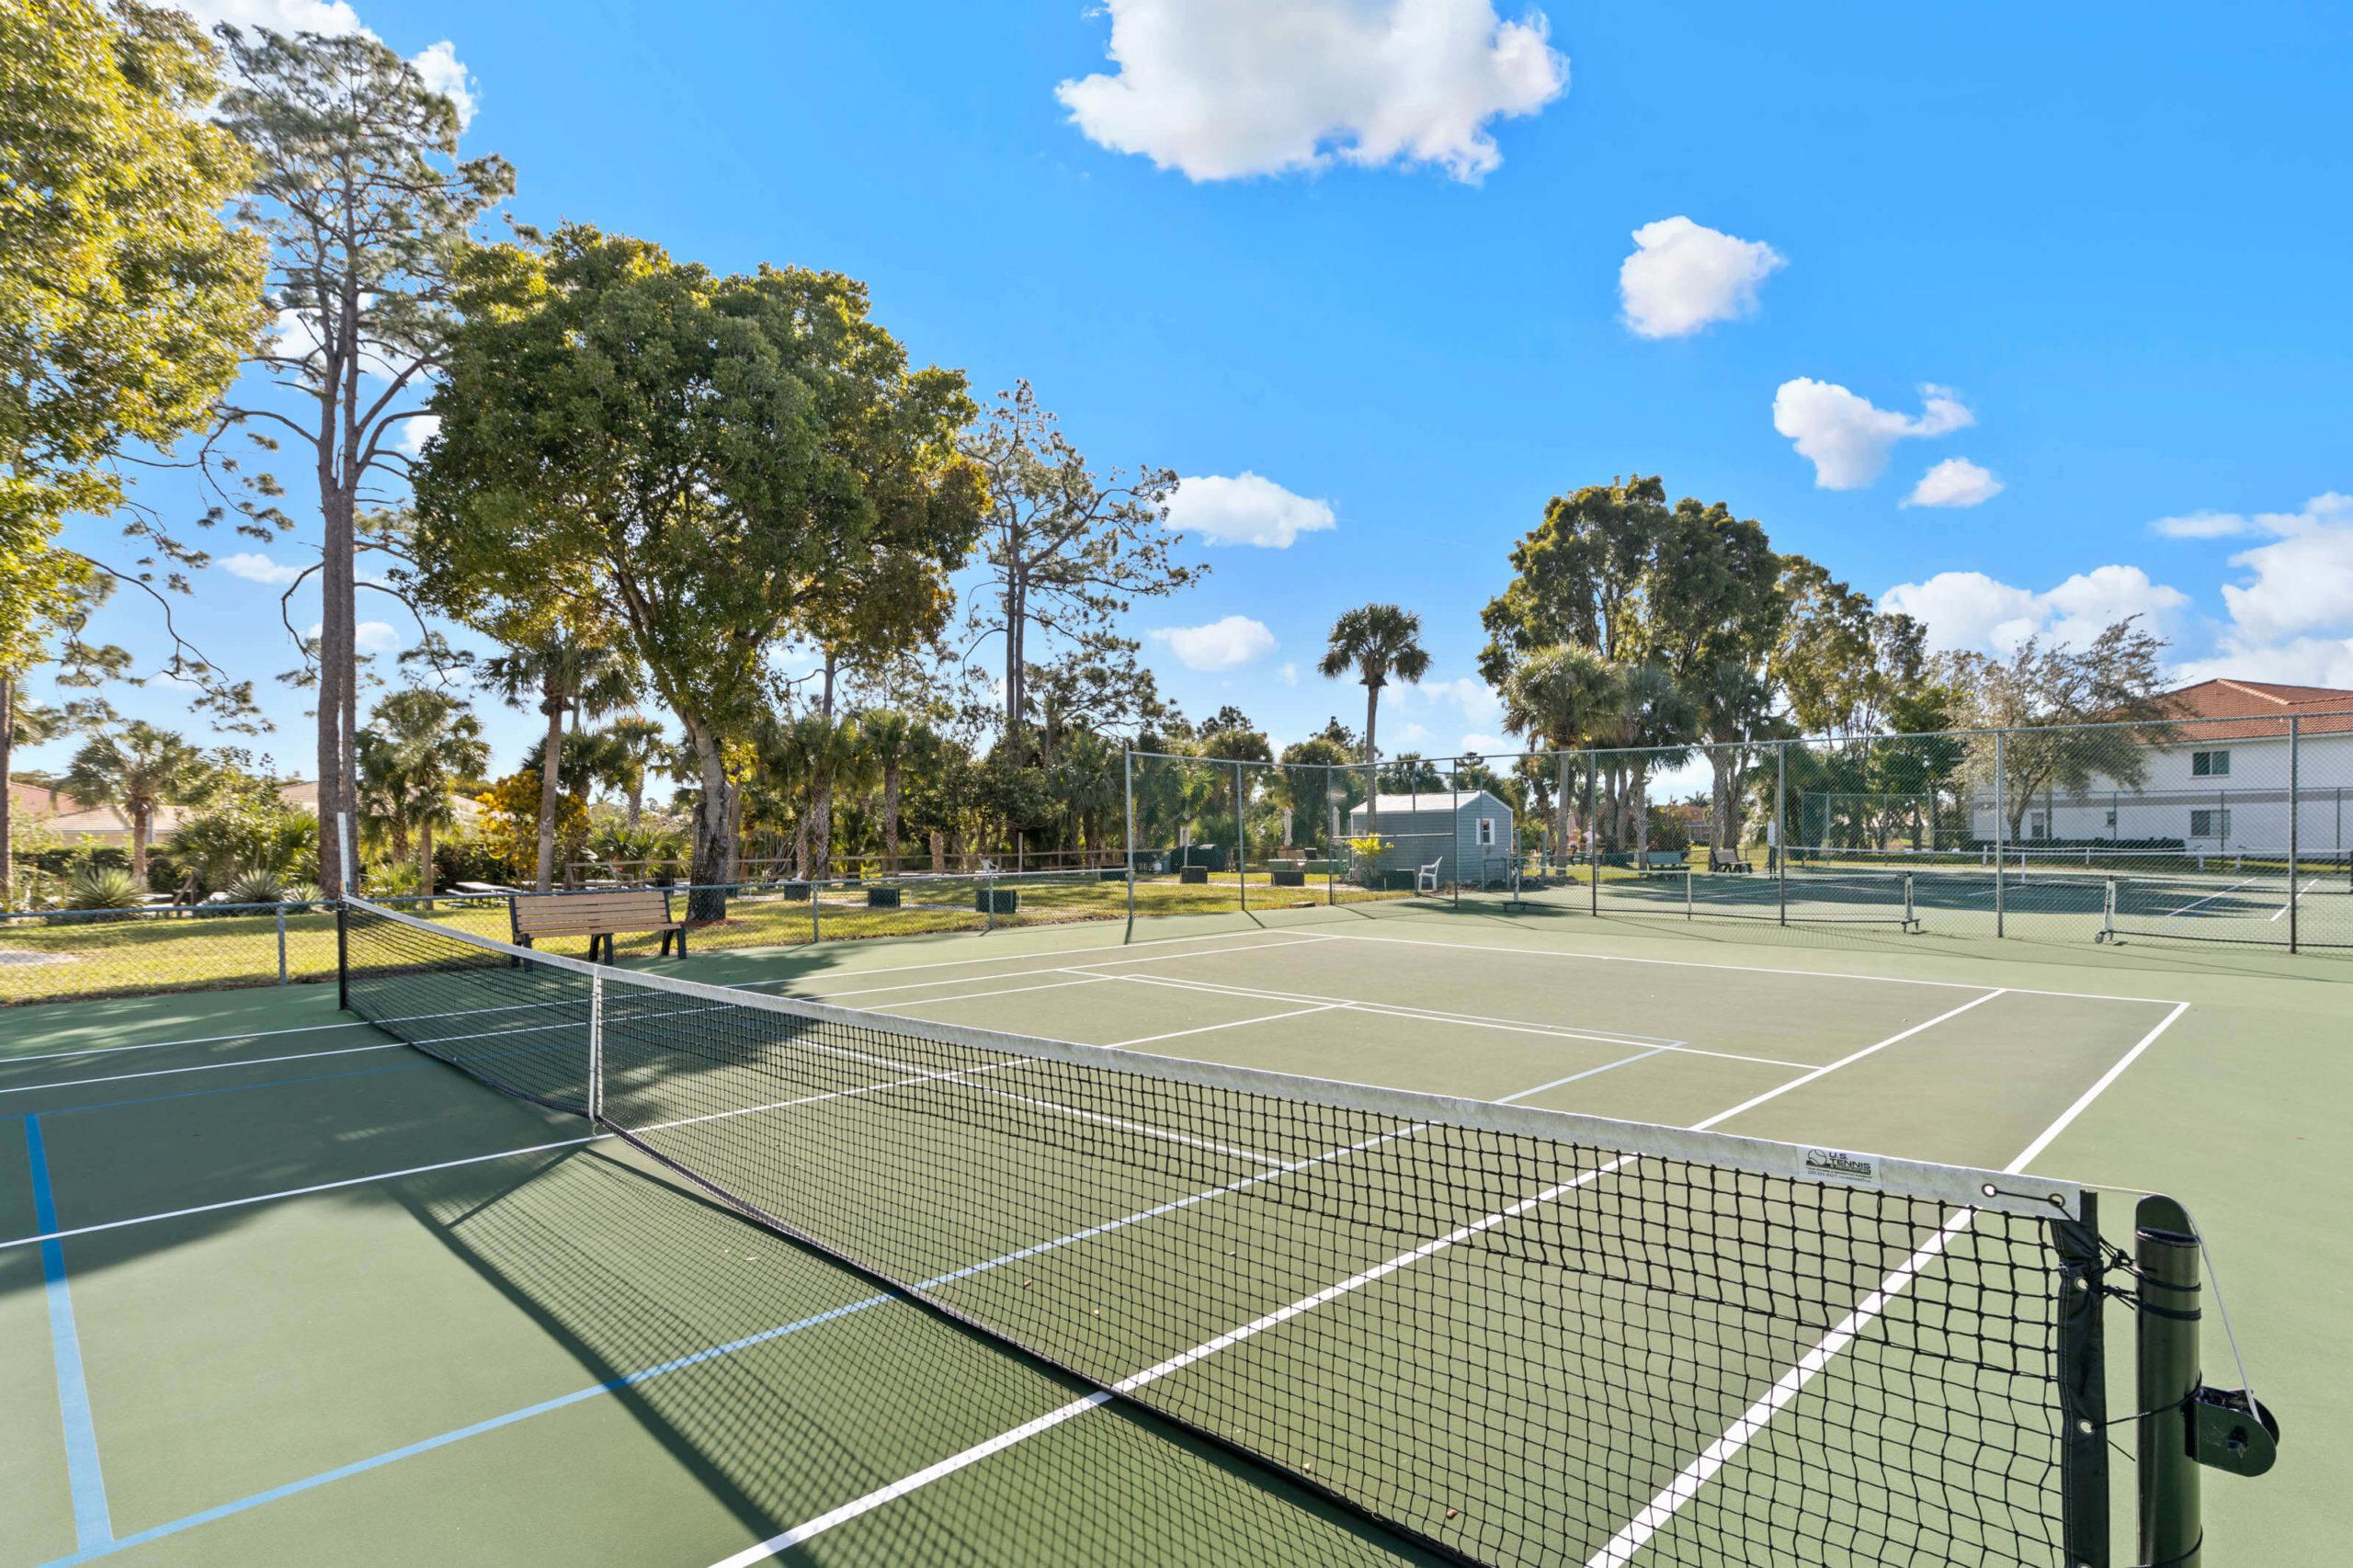 452 Belina Dr 1302 - Tennis